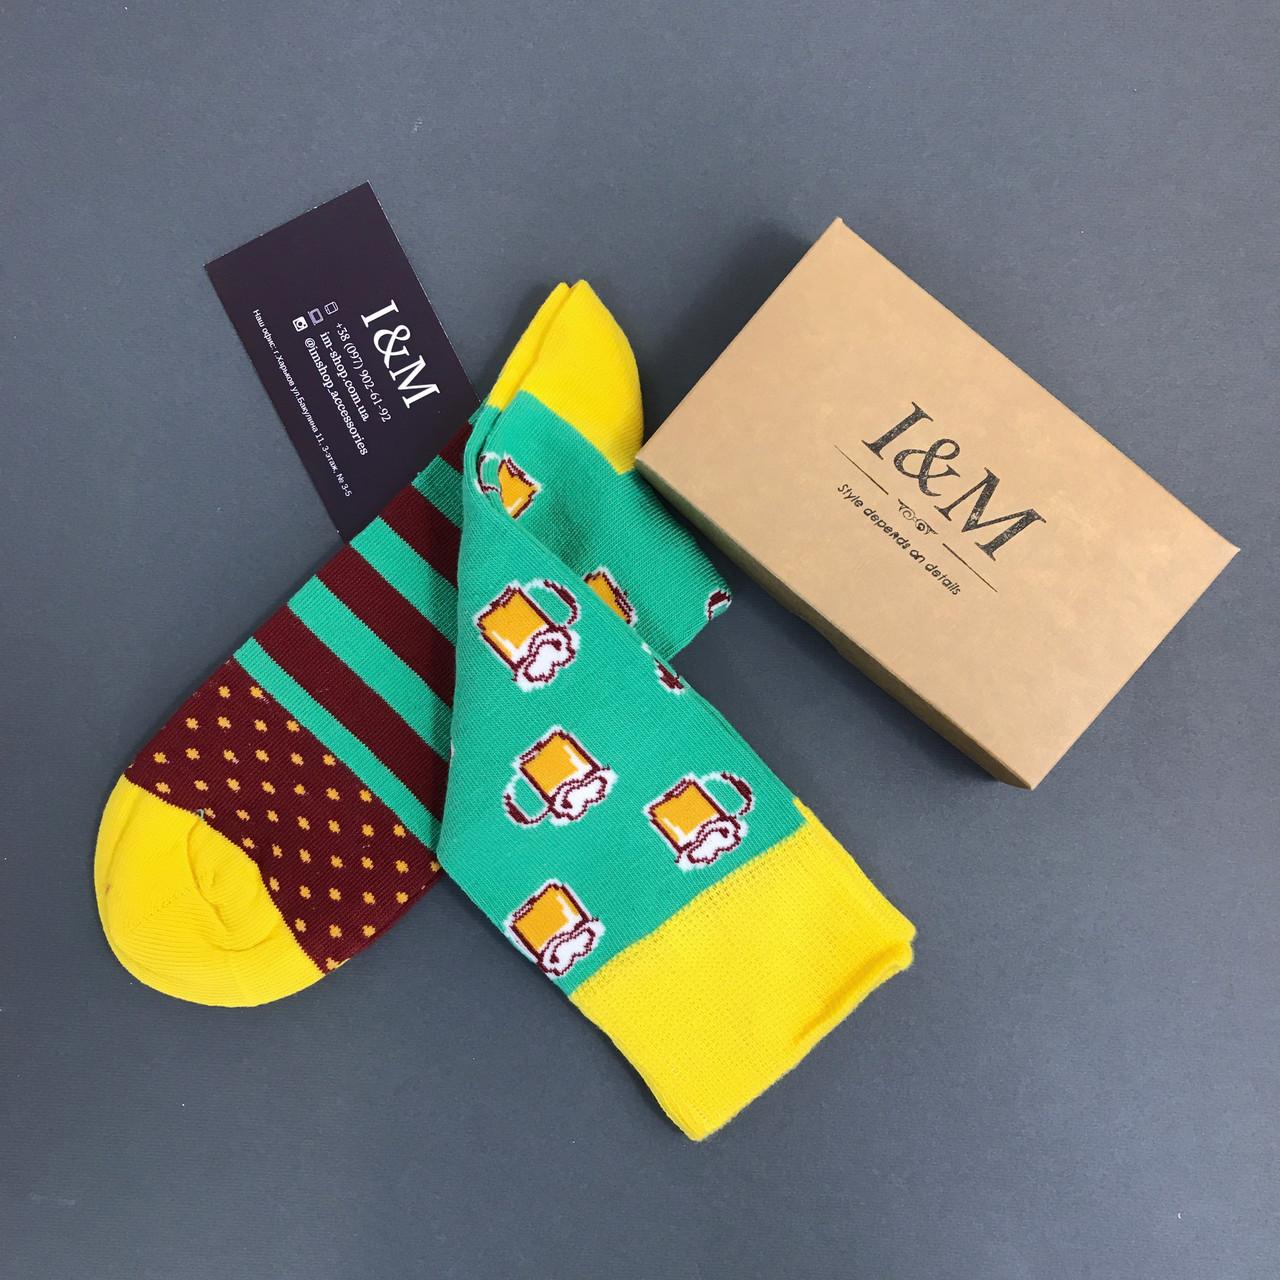 Шкарпетки I&M Craft зеленого кольору з принтом (070149)